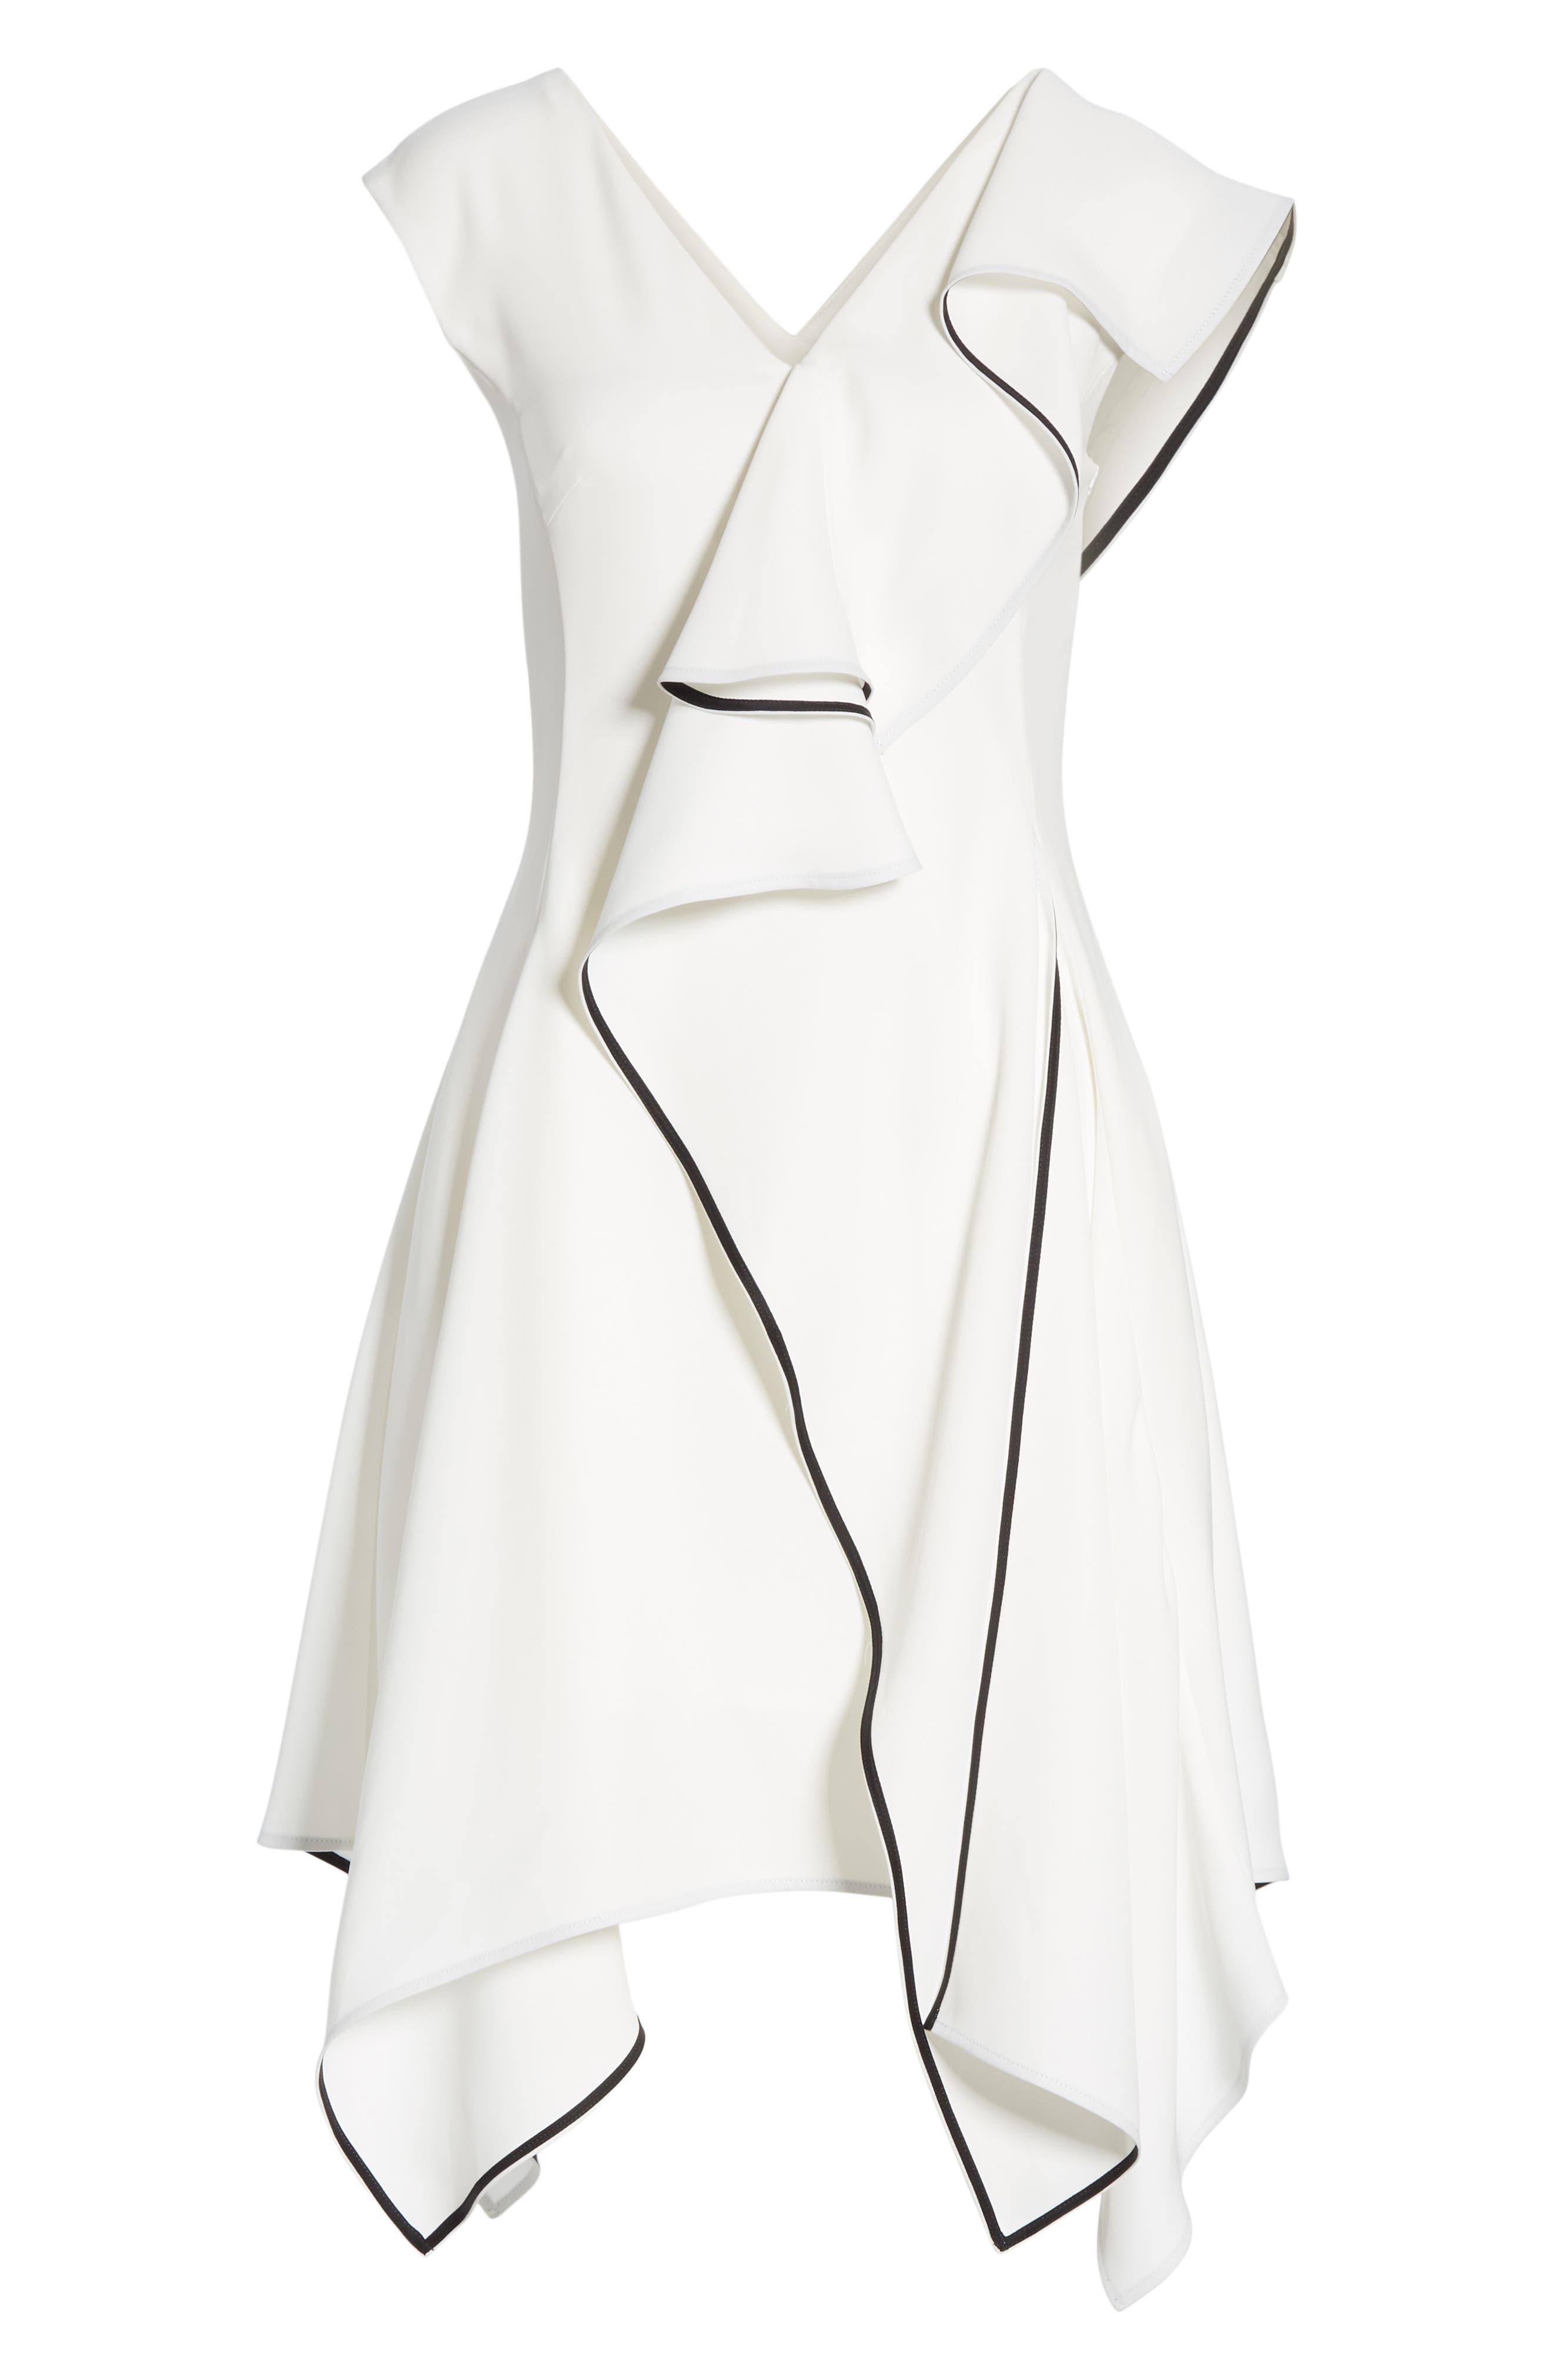 Deconstructed Ruffle Dress,                             Alternate thumbnail 7, color,                             WHITE